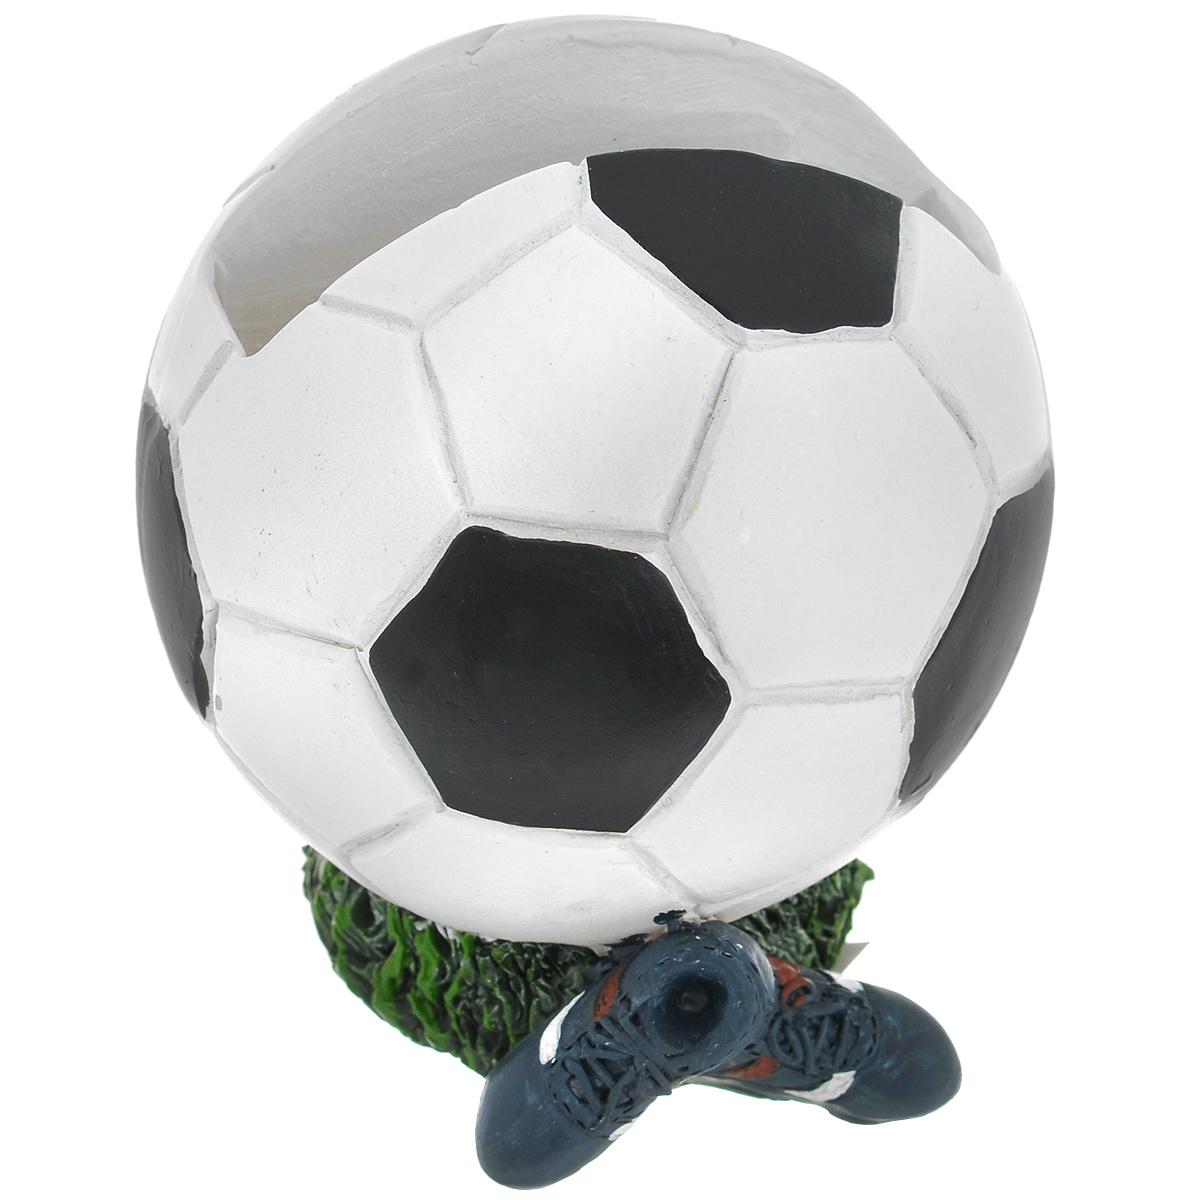 Подставка для мобильного телефона  Футбол . 28934 -  Подставки для оргтехники